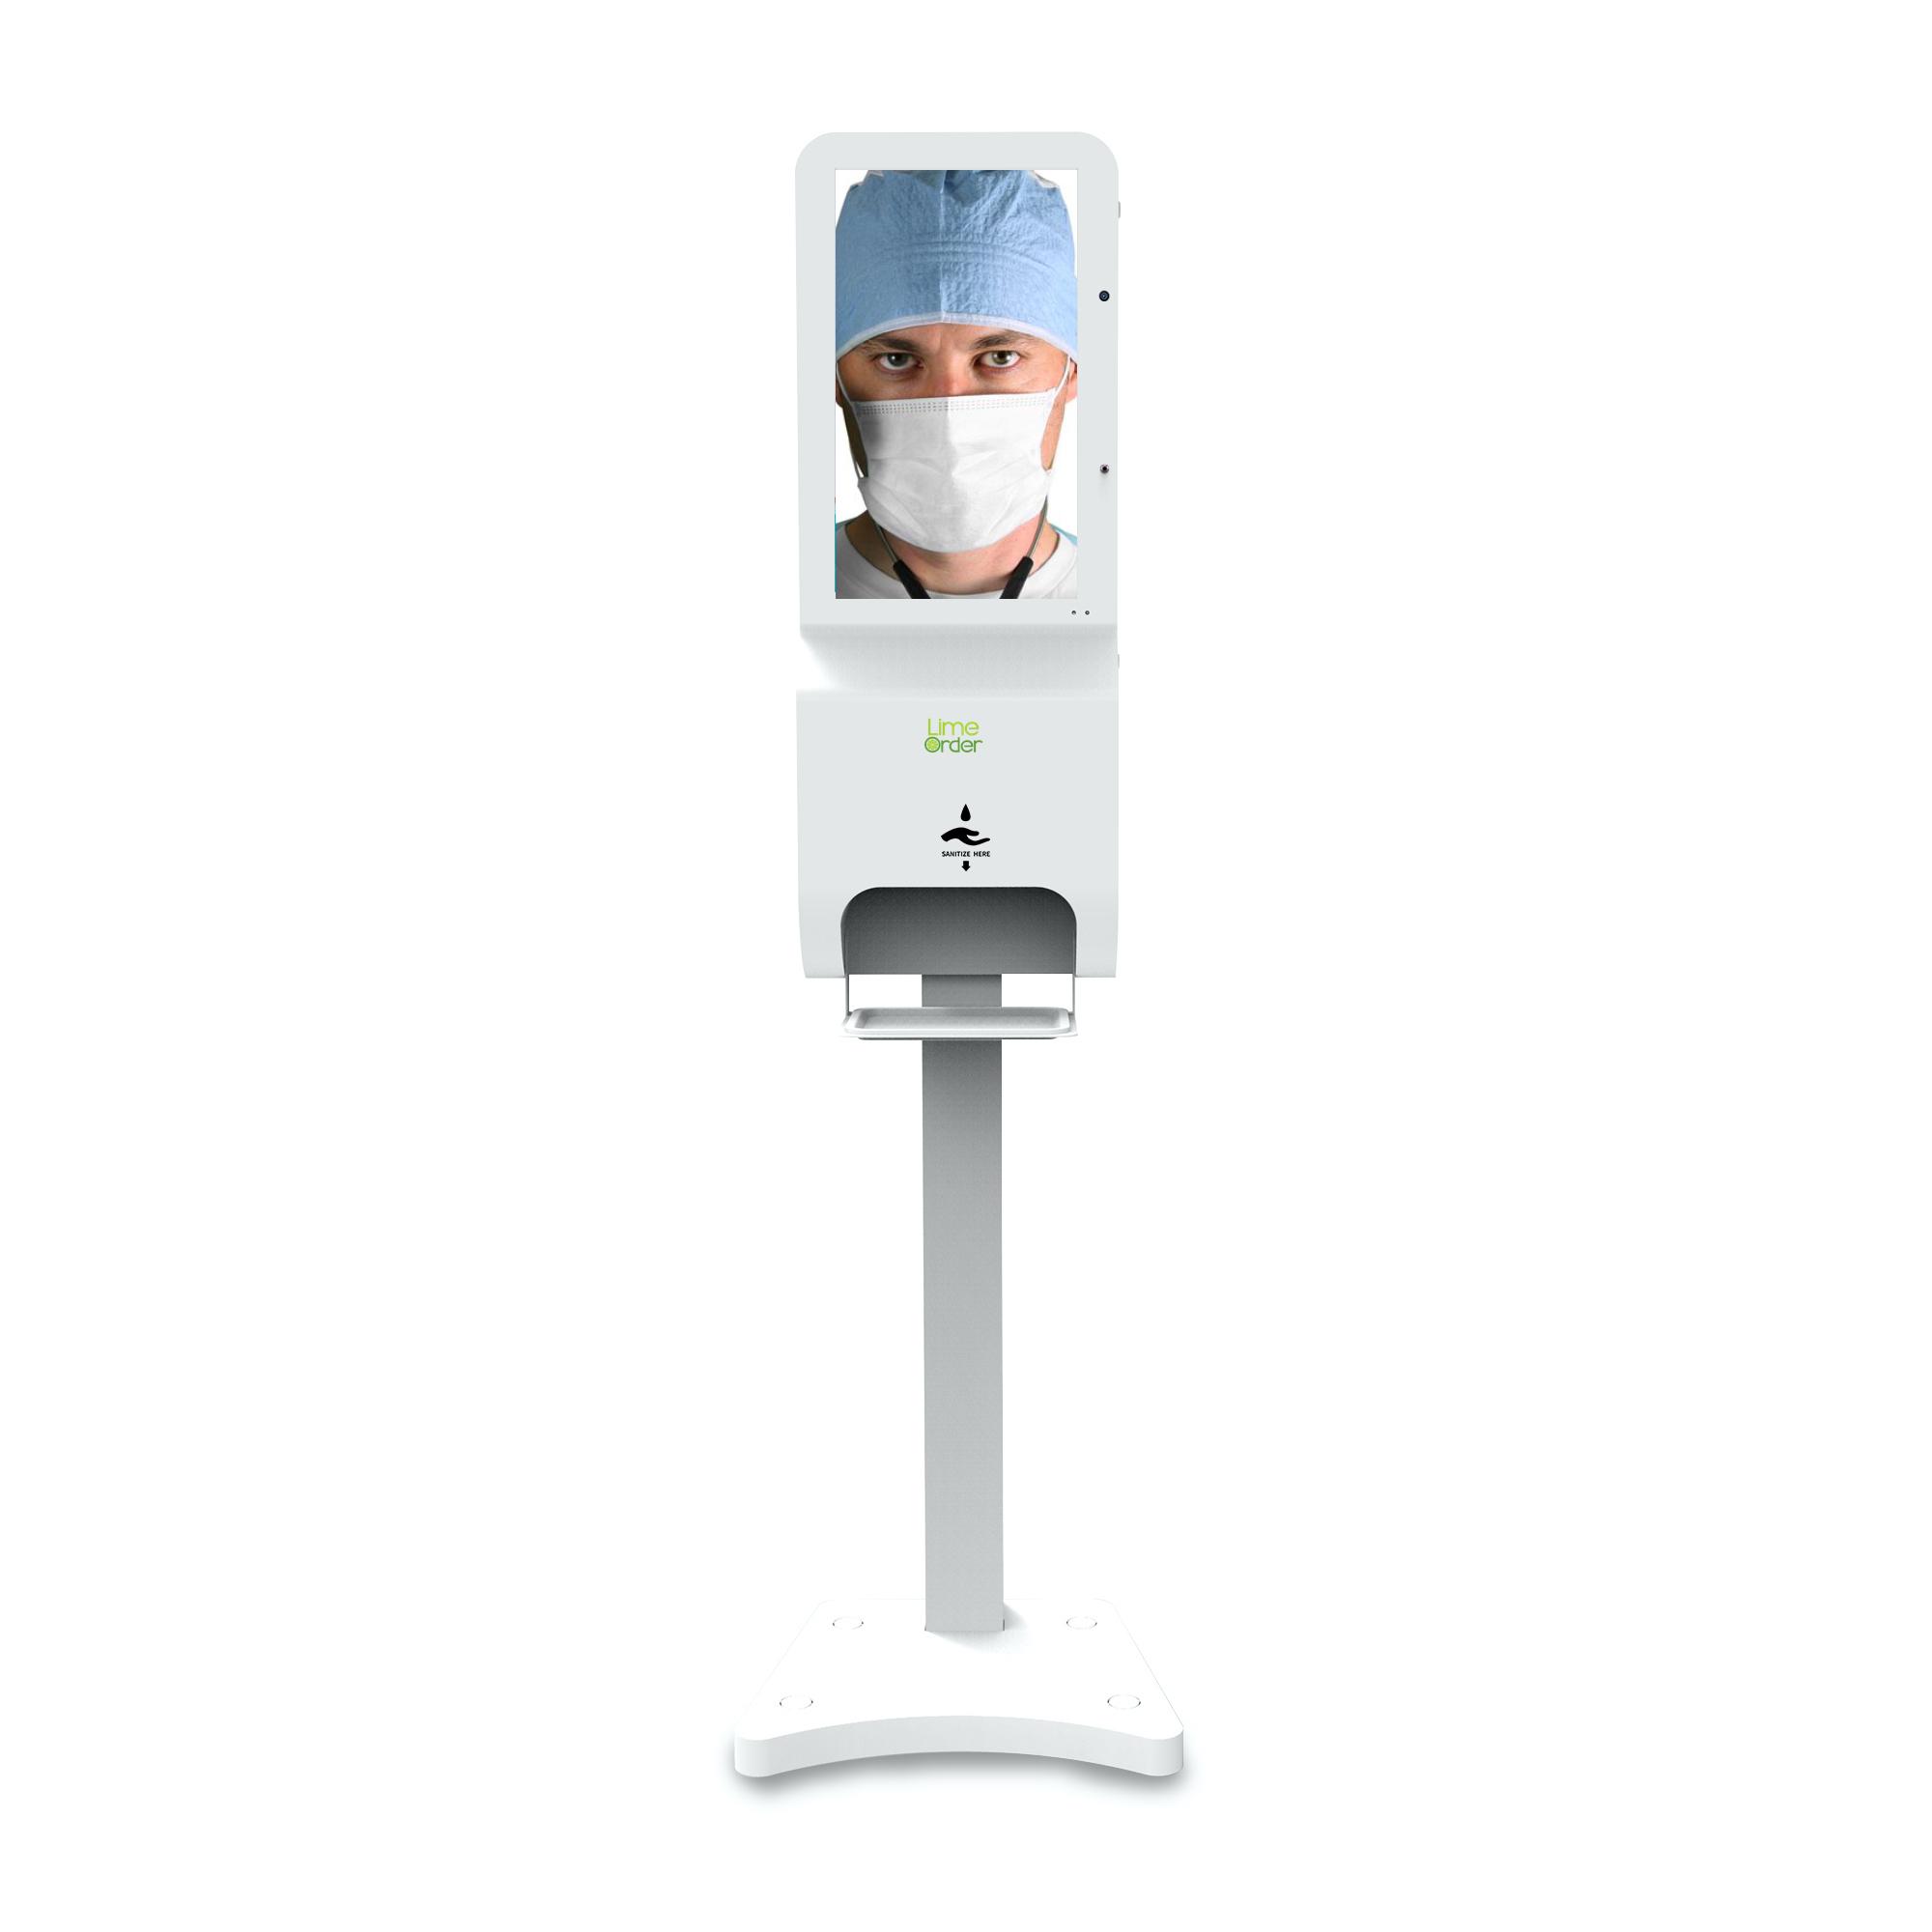 body temperature kiosk